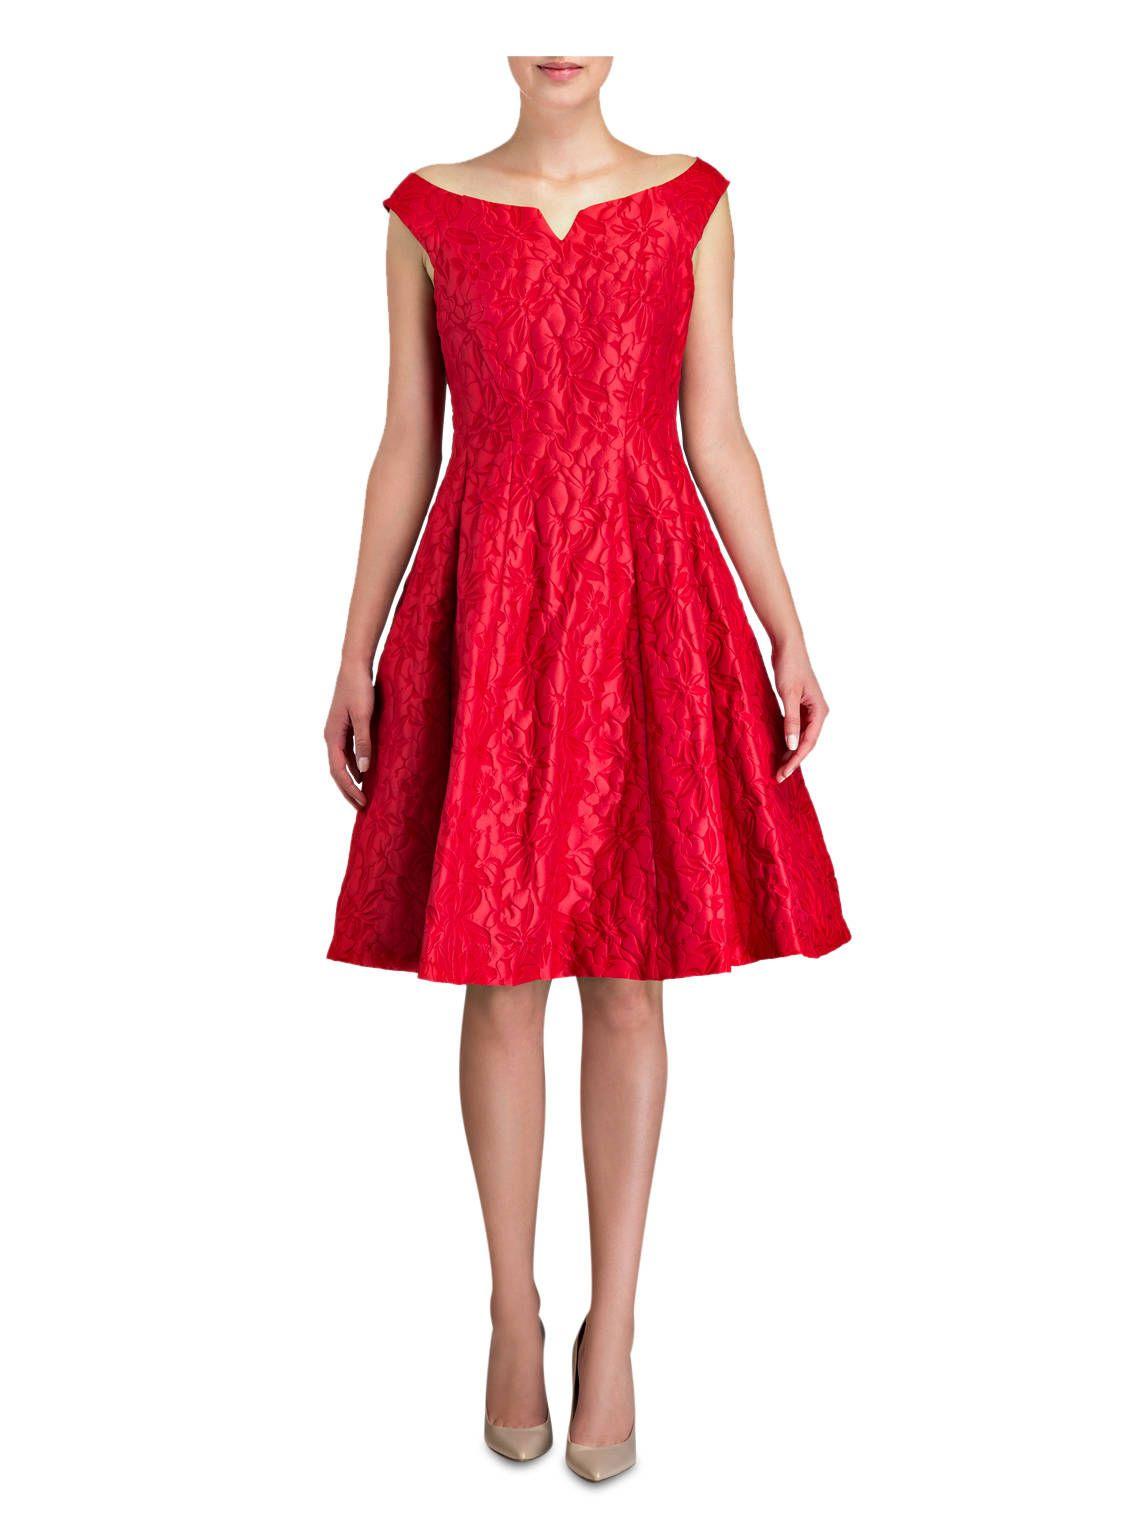 Jacquard-Kleid KIMBERLEY von coast bei Breuninger Kimberly Jacquard ...